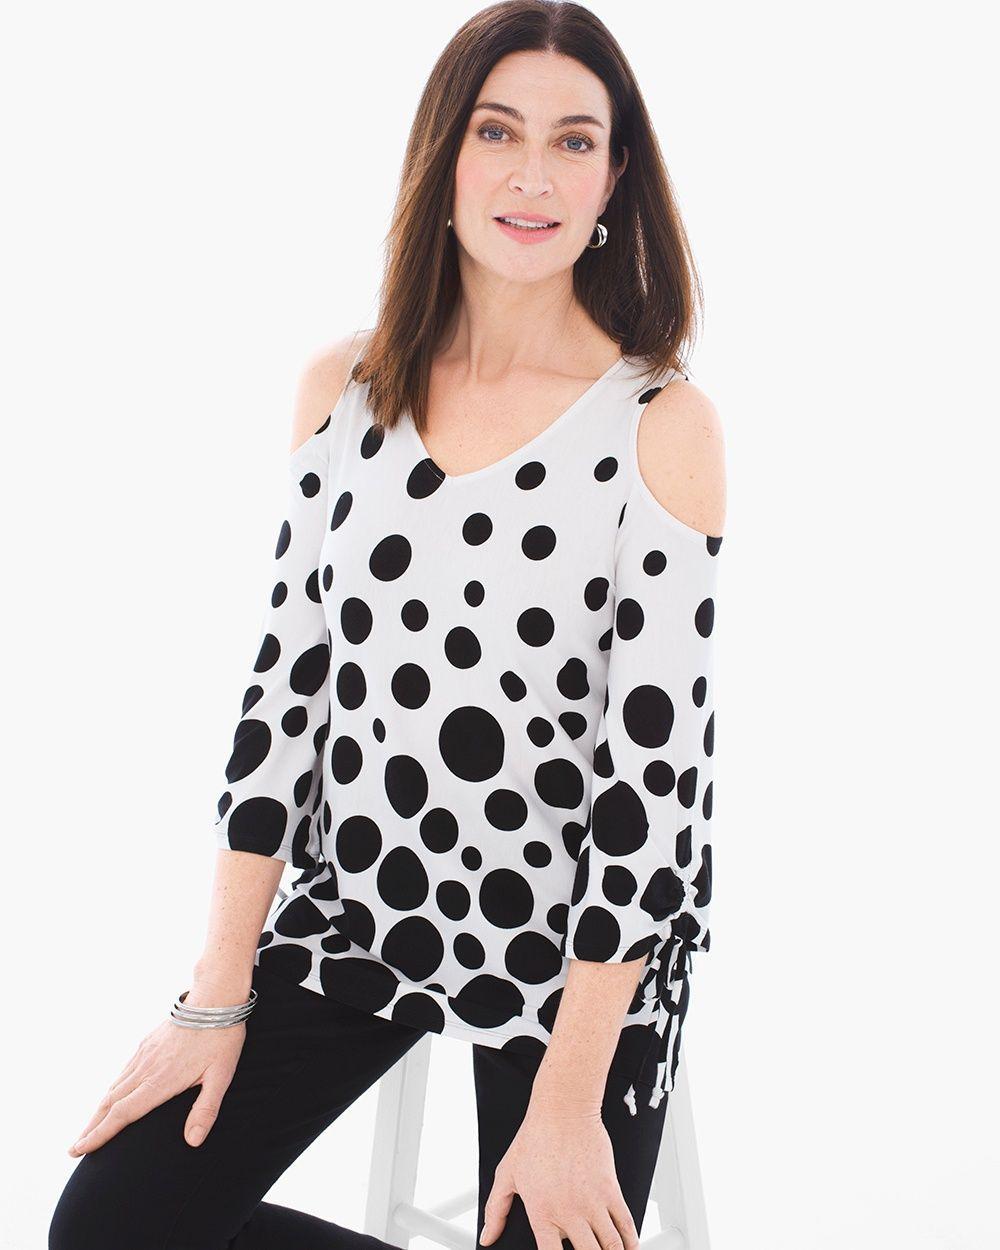 79d85b0c55b Chico s Women s Dot-Print Cold-Shoulder Top